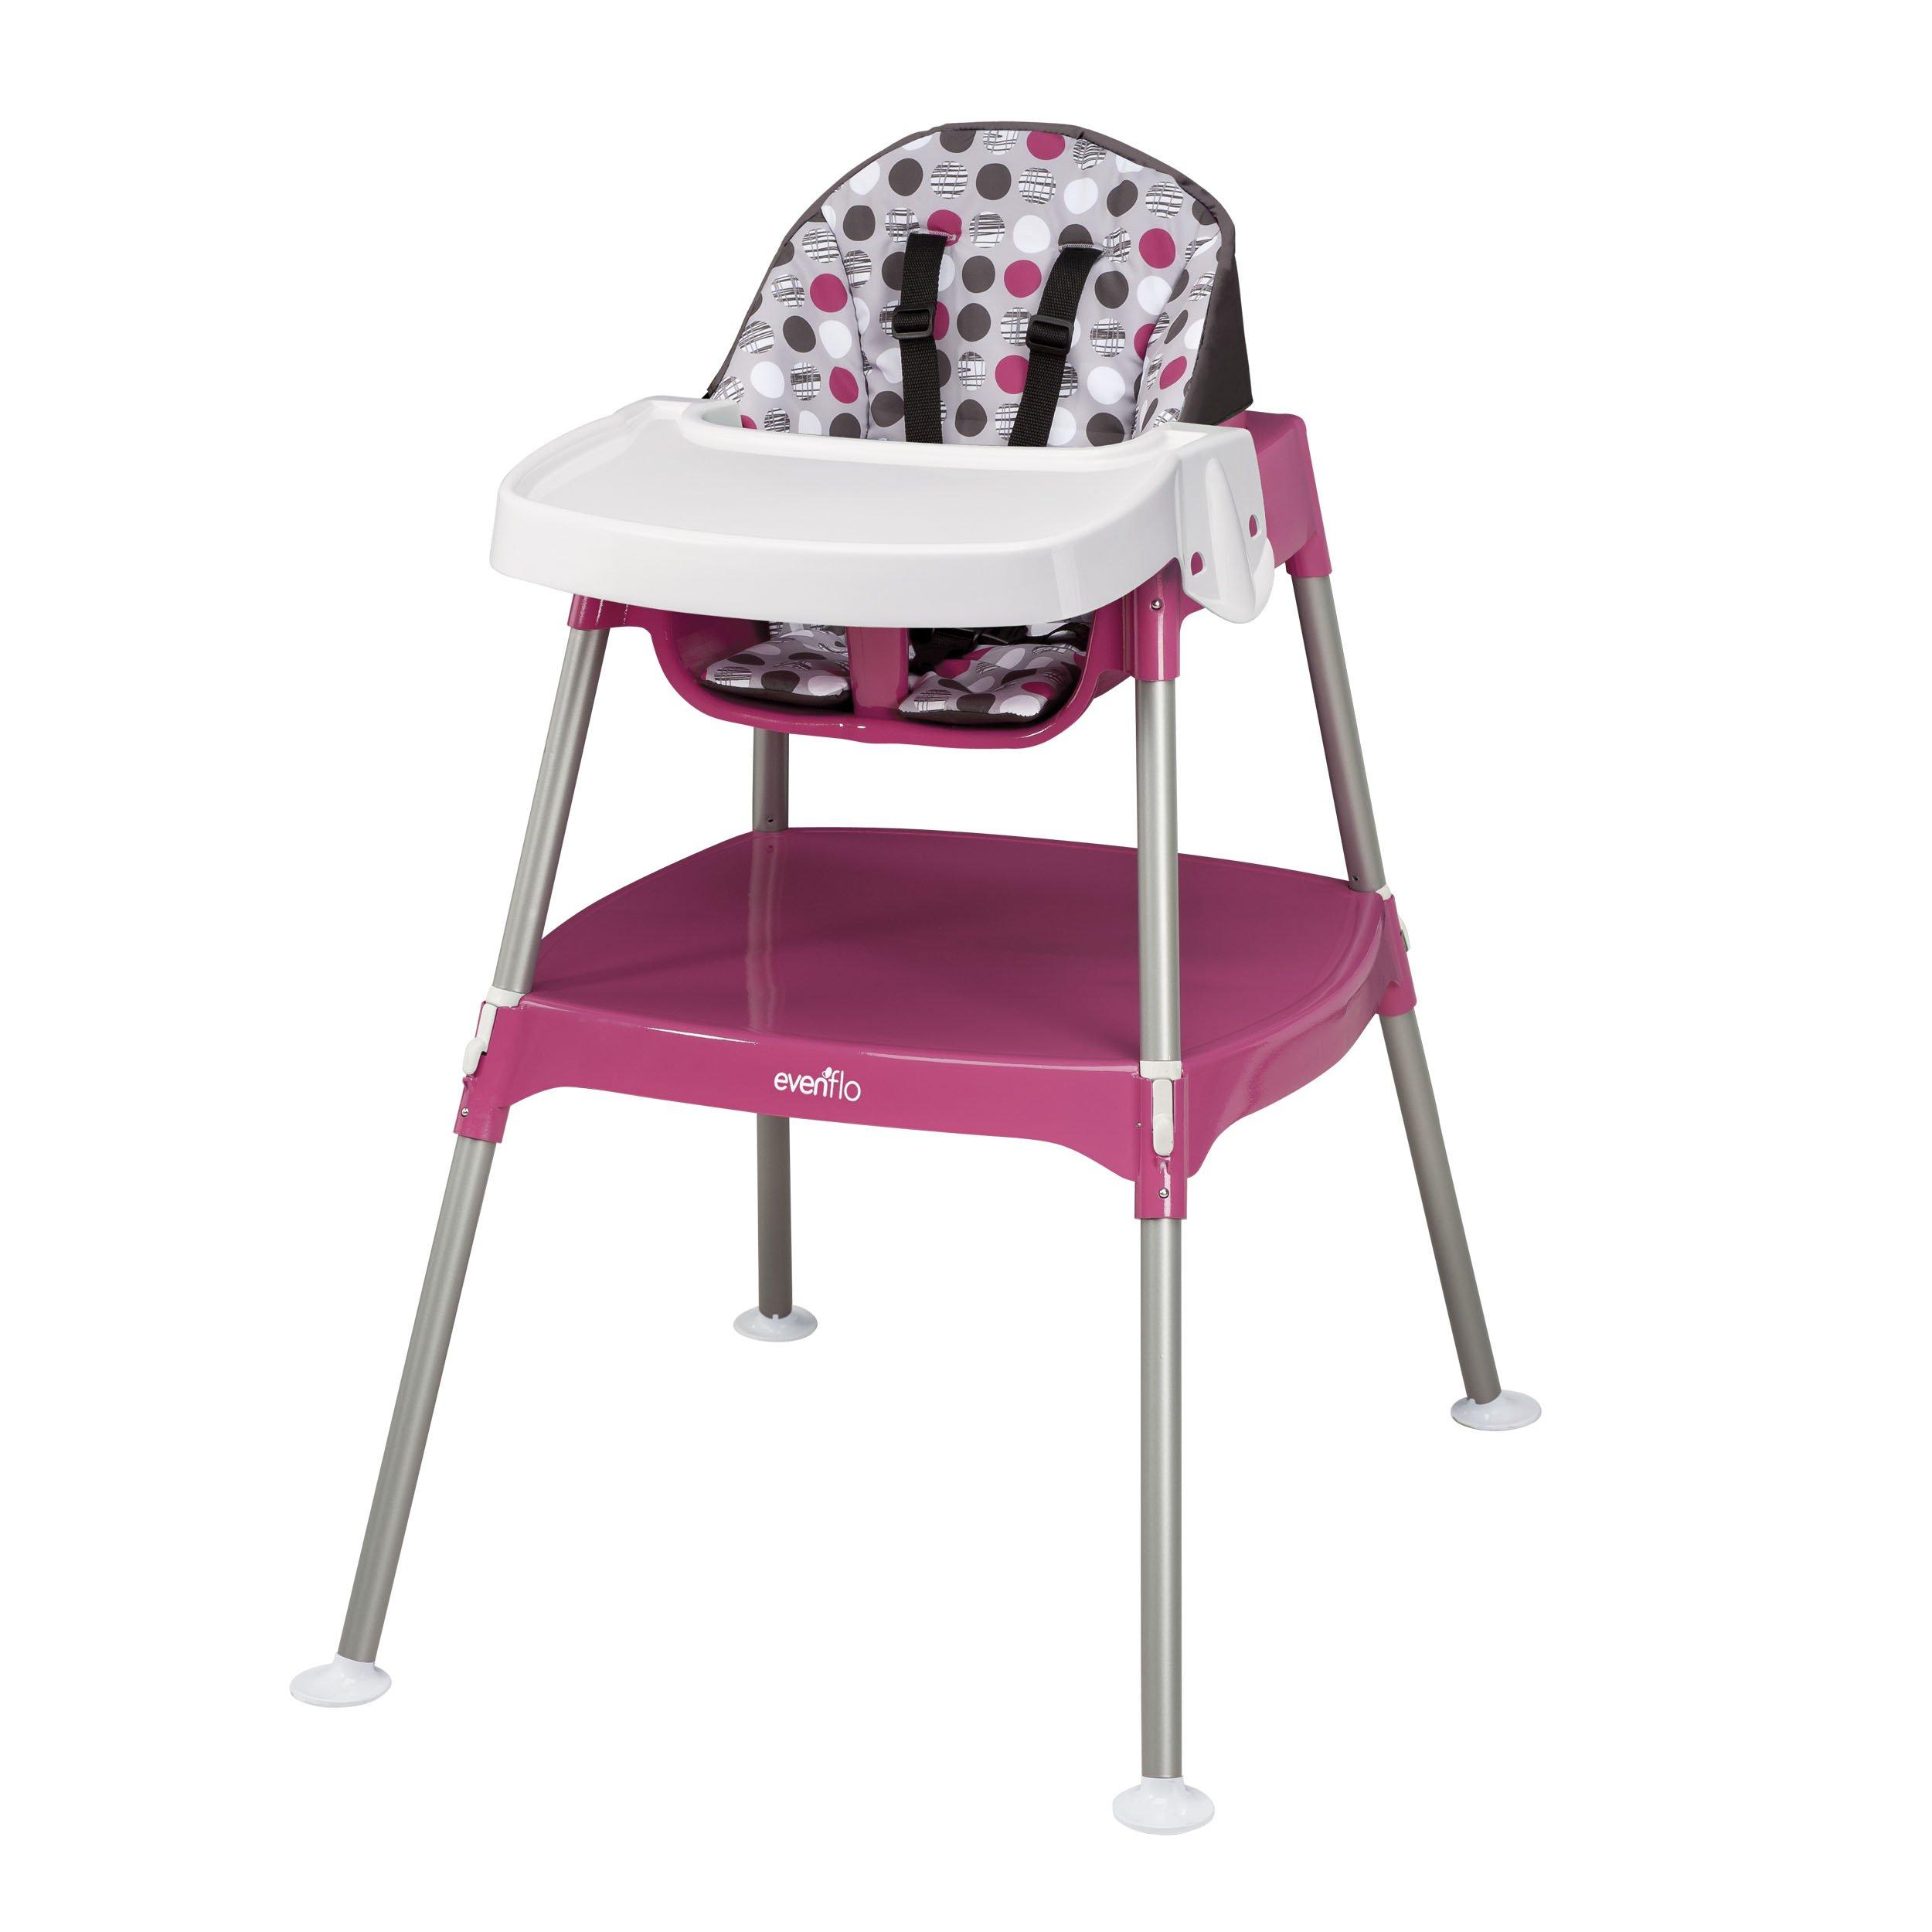 Super Cheap Evenflo Babygo High Chair Find Evenflo Babygo High Creativecarmelina Interior Chair Design Creativecarmelinacom